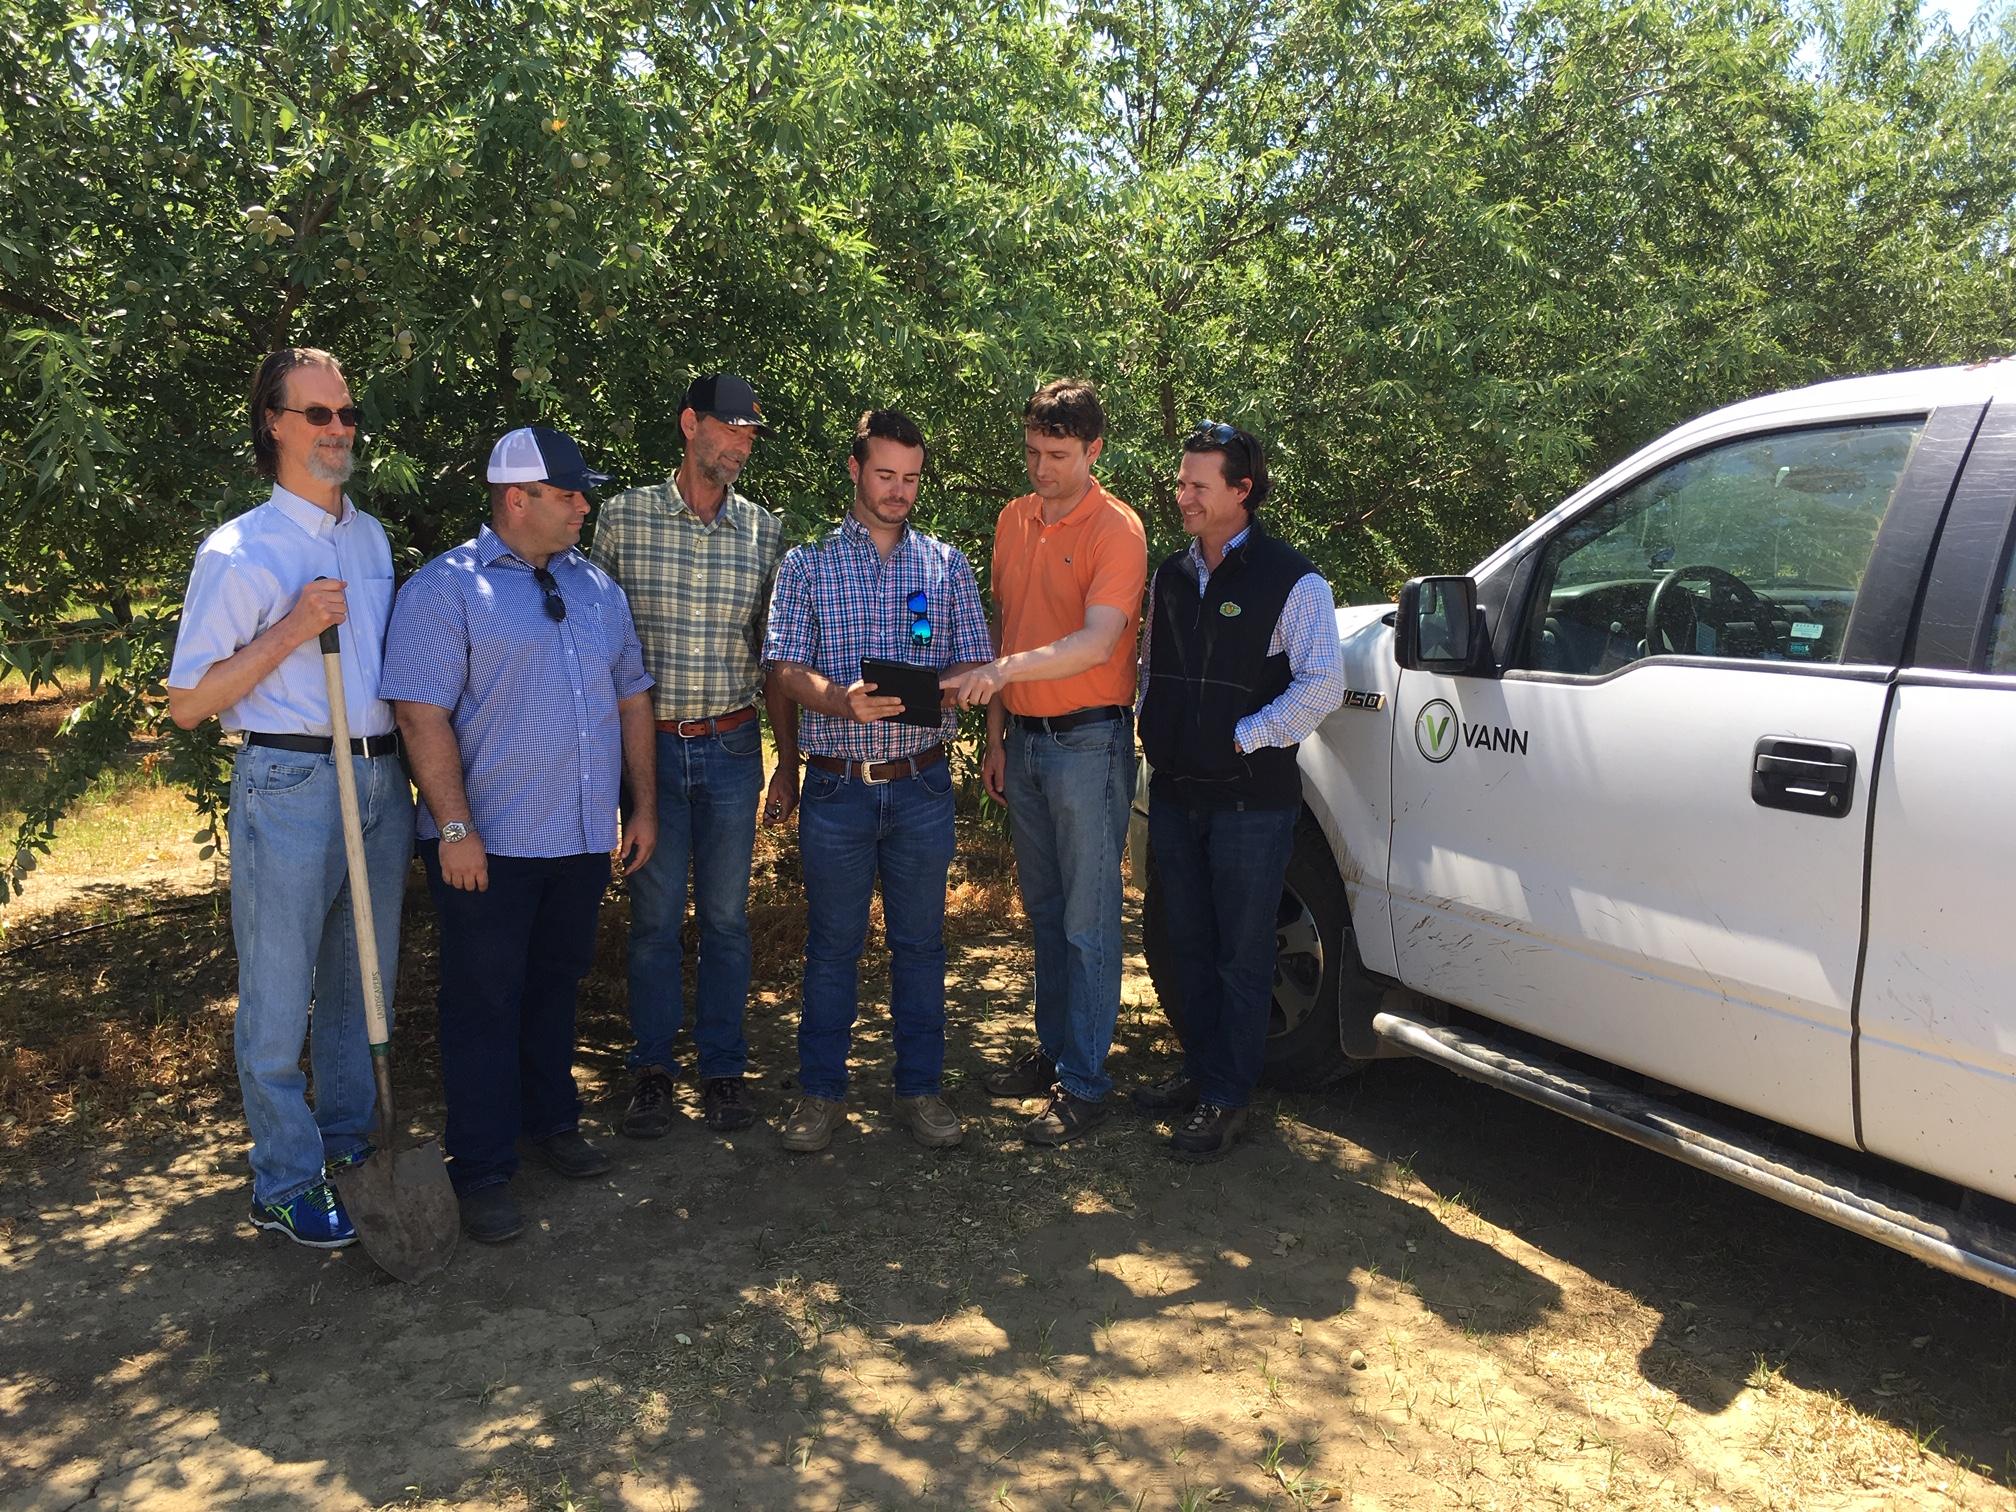 Innovator Spotlight: PowWow, Water Management Made Easy - The Vine